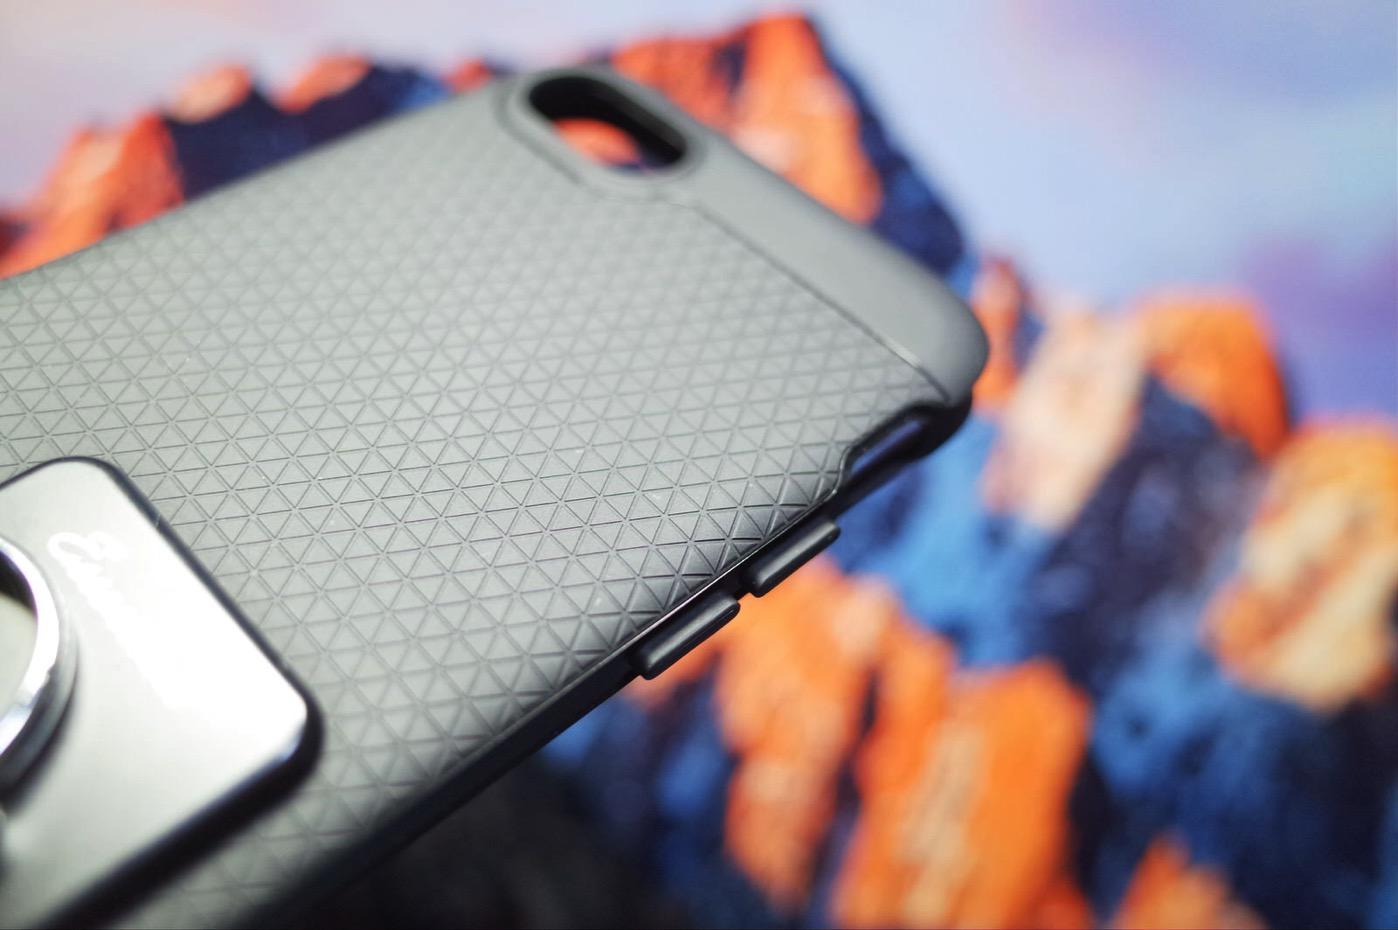 【Spigen】 iPhone7 ケース, ネオ・ハイブリッド [ 米軍MIL規格取得 二重構造 バンパー ] アイフォン 7 用 カバー (iPhone7, ガンメタル)-2